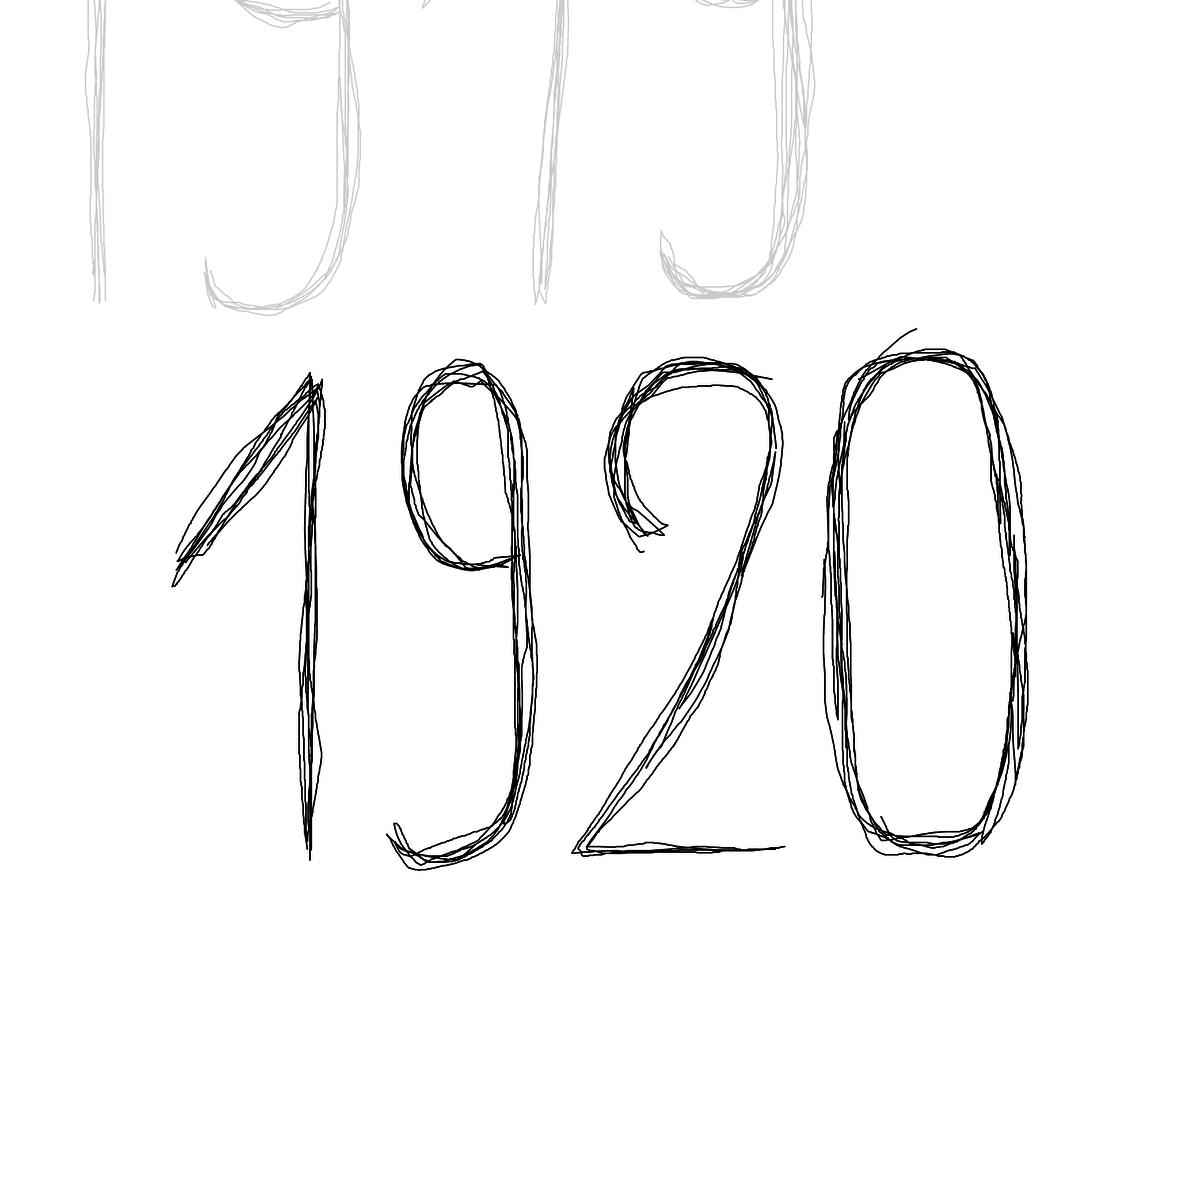 BAAAM drawing#18978 lat:50.2635688781738300lng: 19.0240325927734380